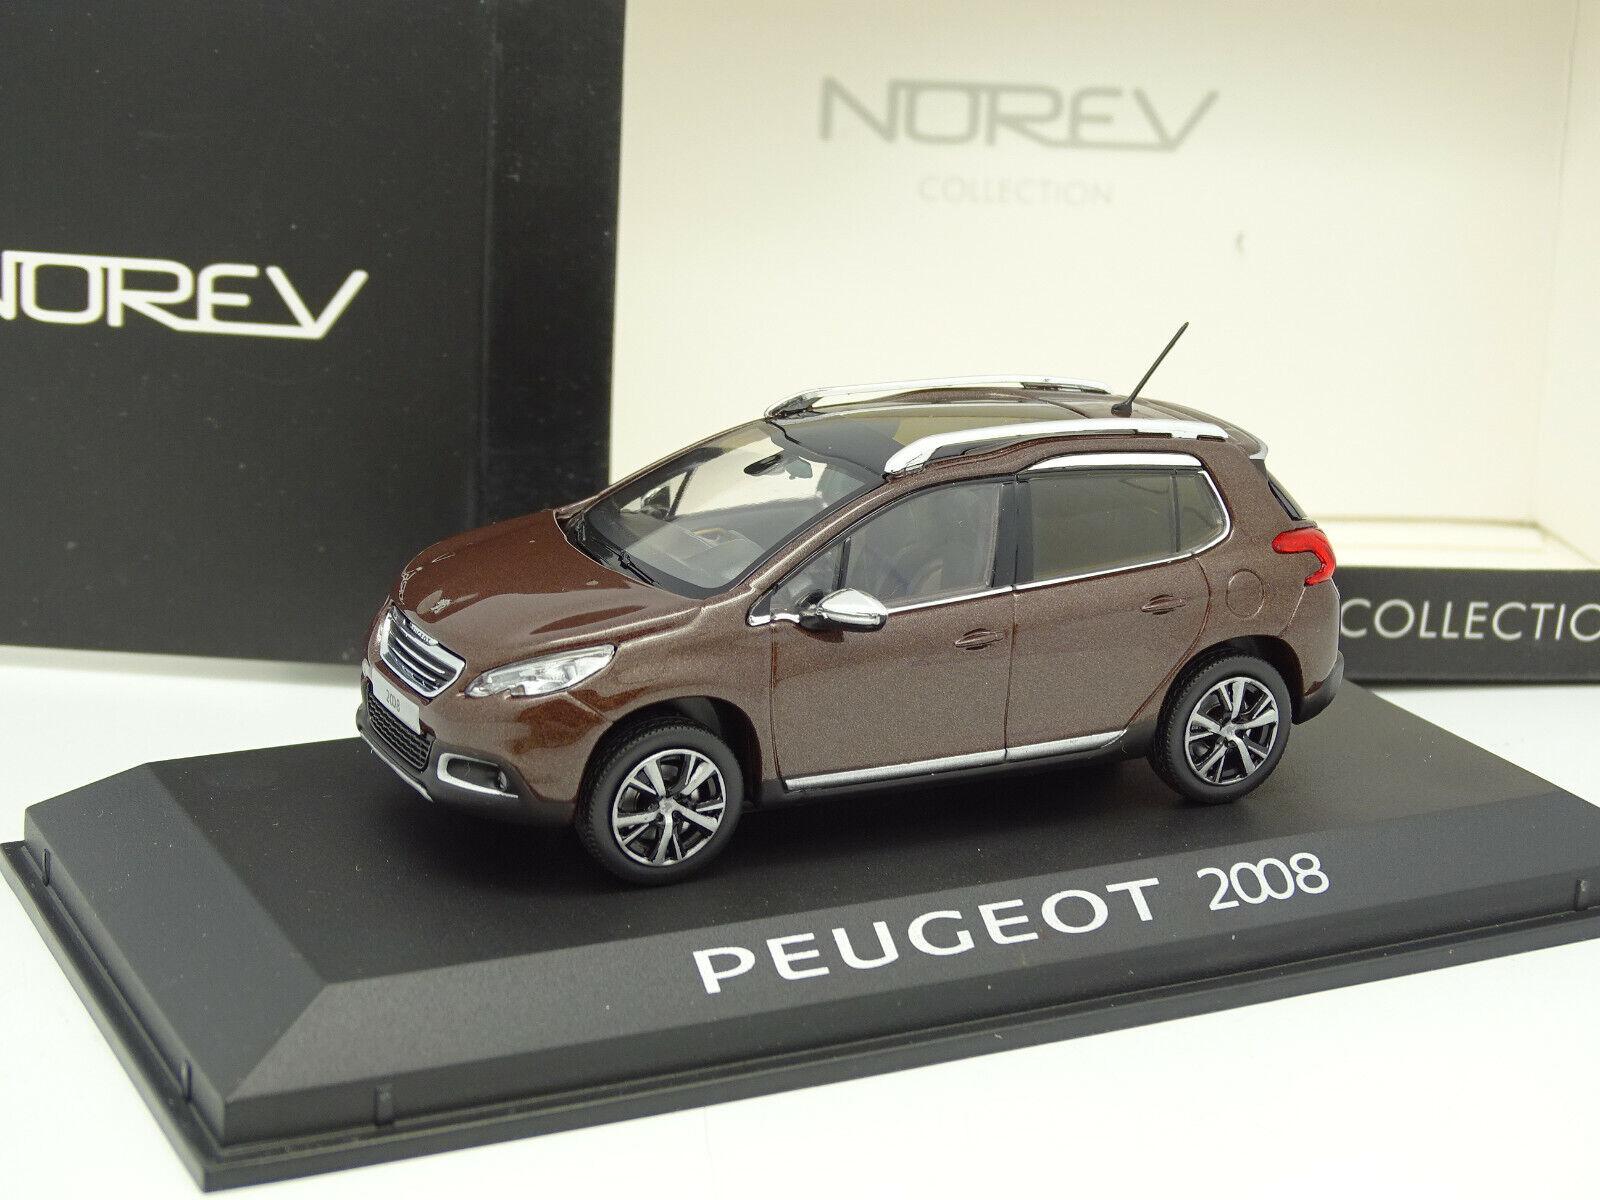 en venta en línea Norev 1 43 - Peugeot Peugeot Peugeot 2008 marrón  ventas directas de fábrica